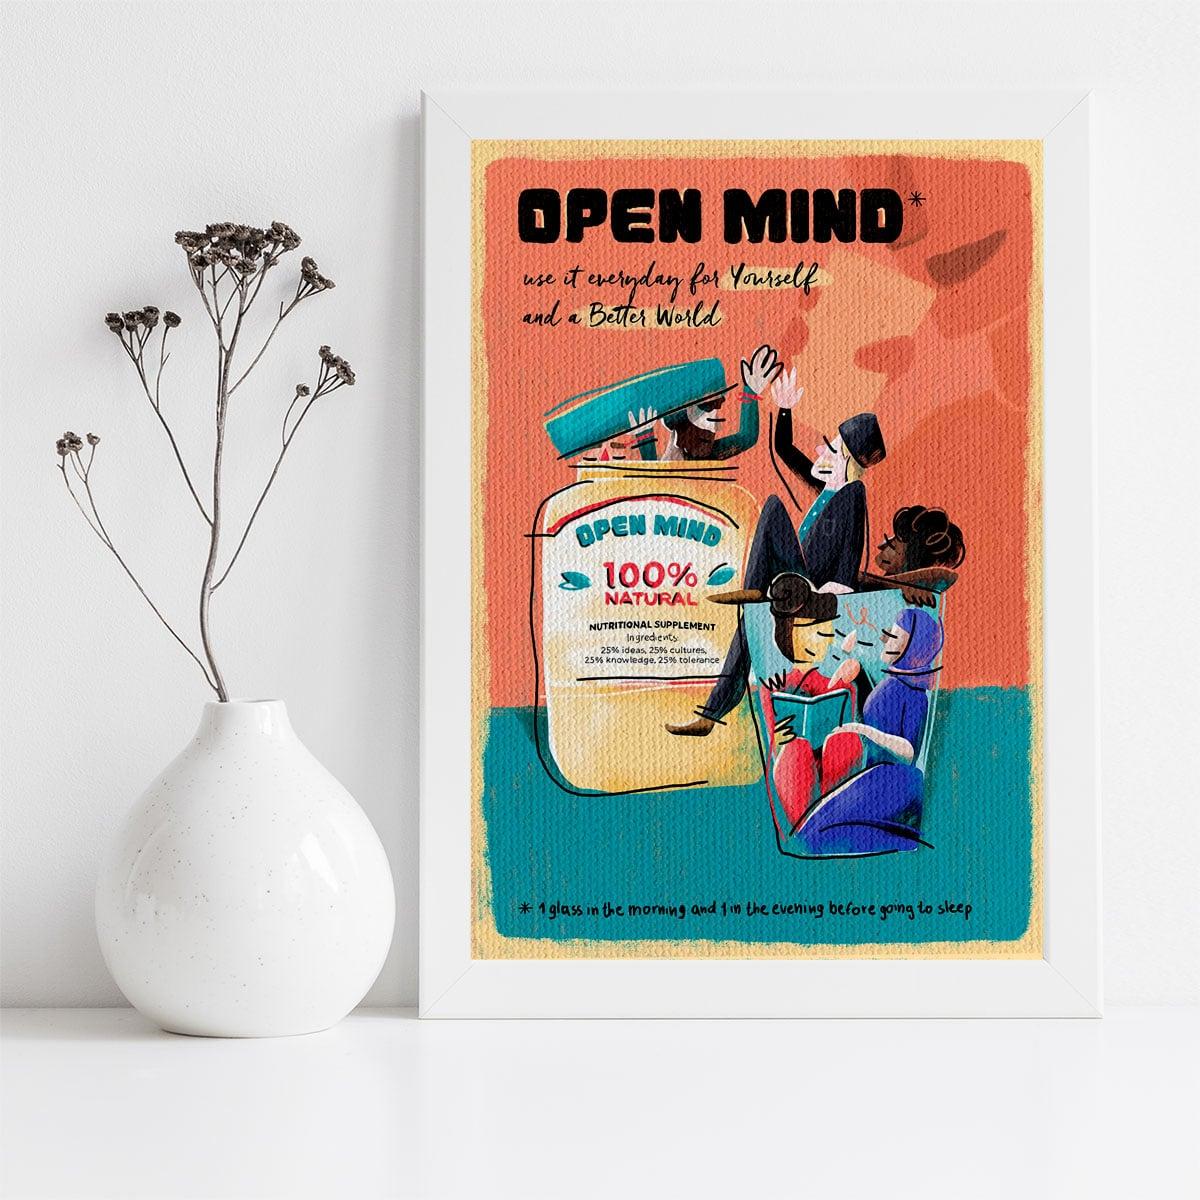 Open-Mind-ambientato-verticale